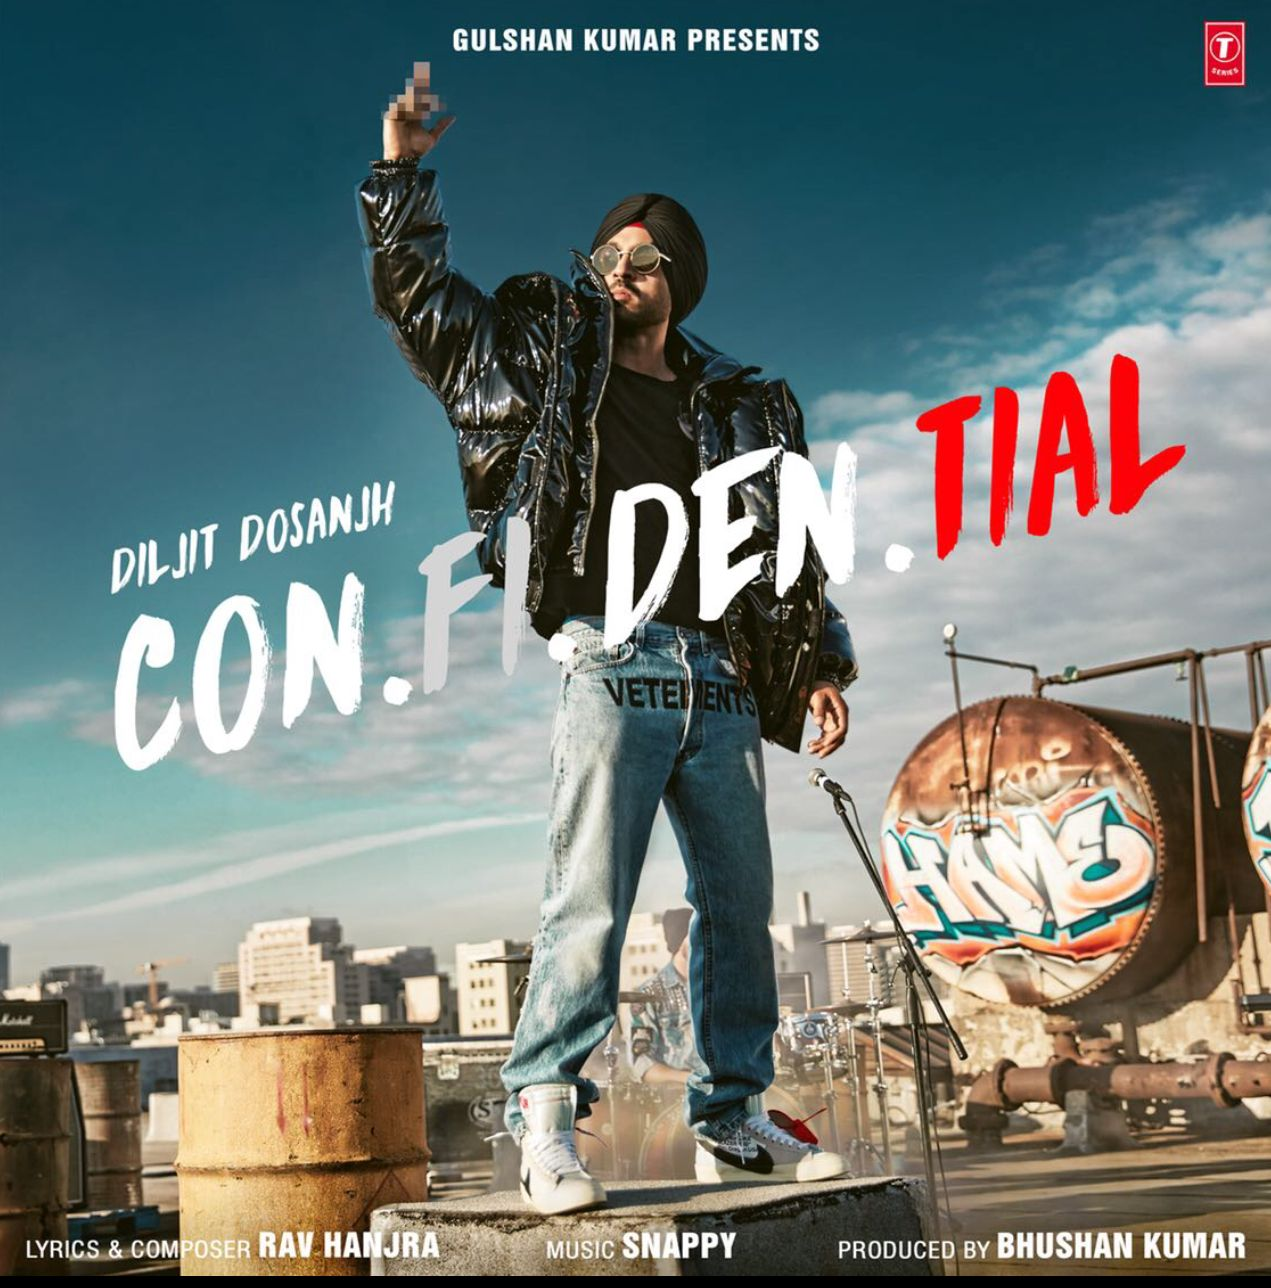 Pin By Harleen Sanghera On Iℓʝit Sѕaiʝn Mp3 Song Download Mp3 Song Diljit Dosanjh